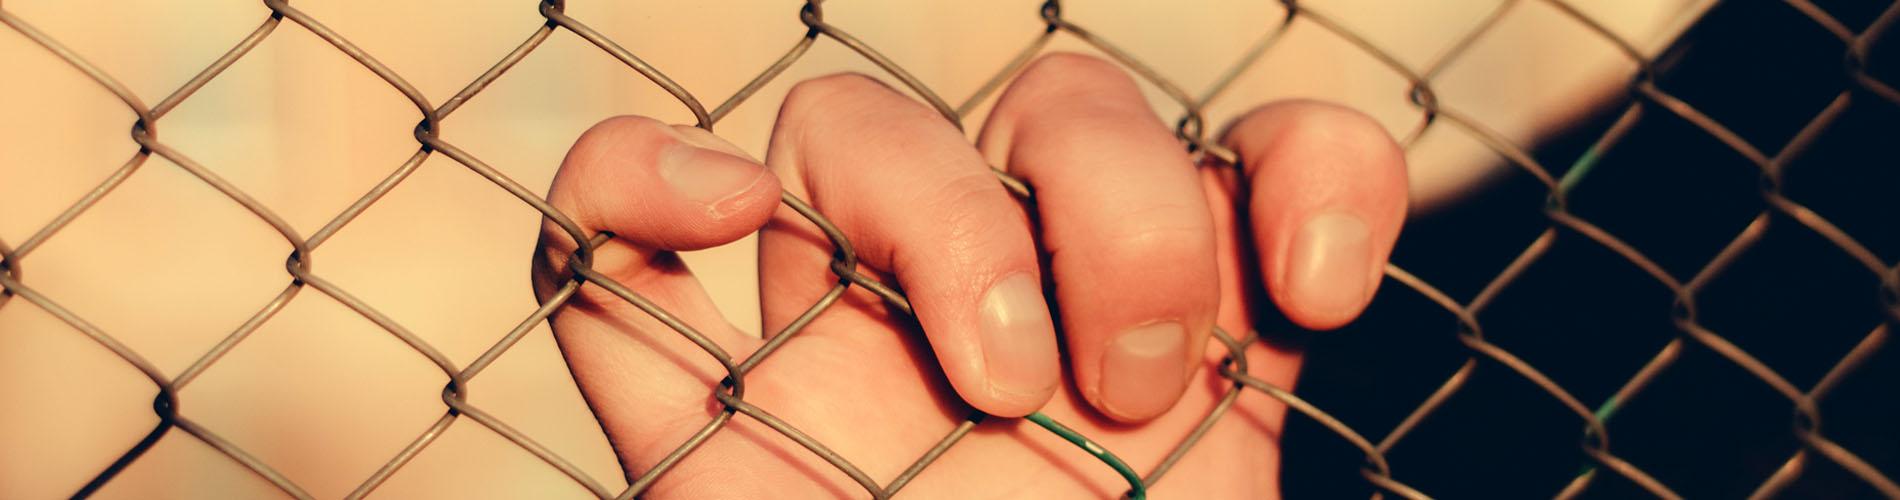 Centros_penitenciarios